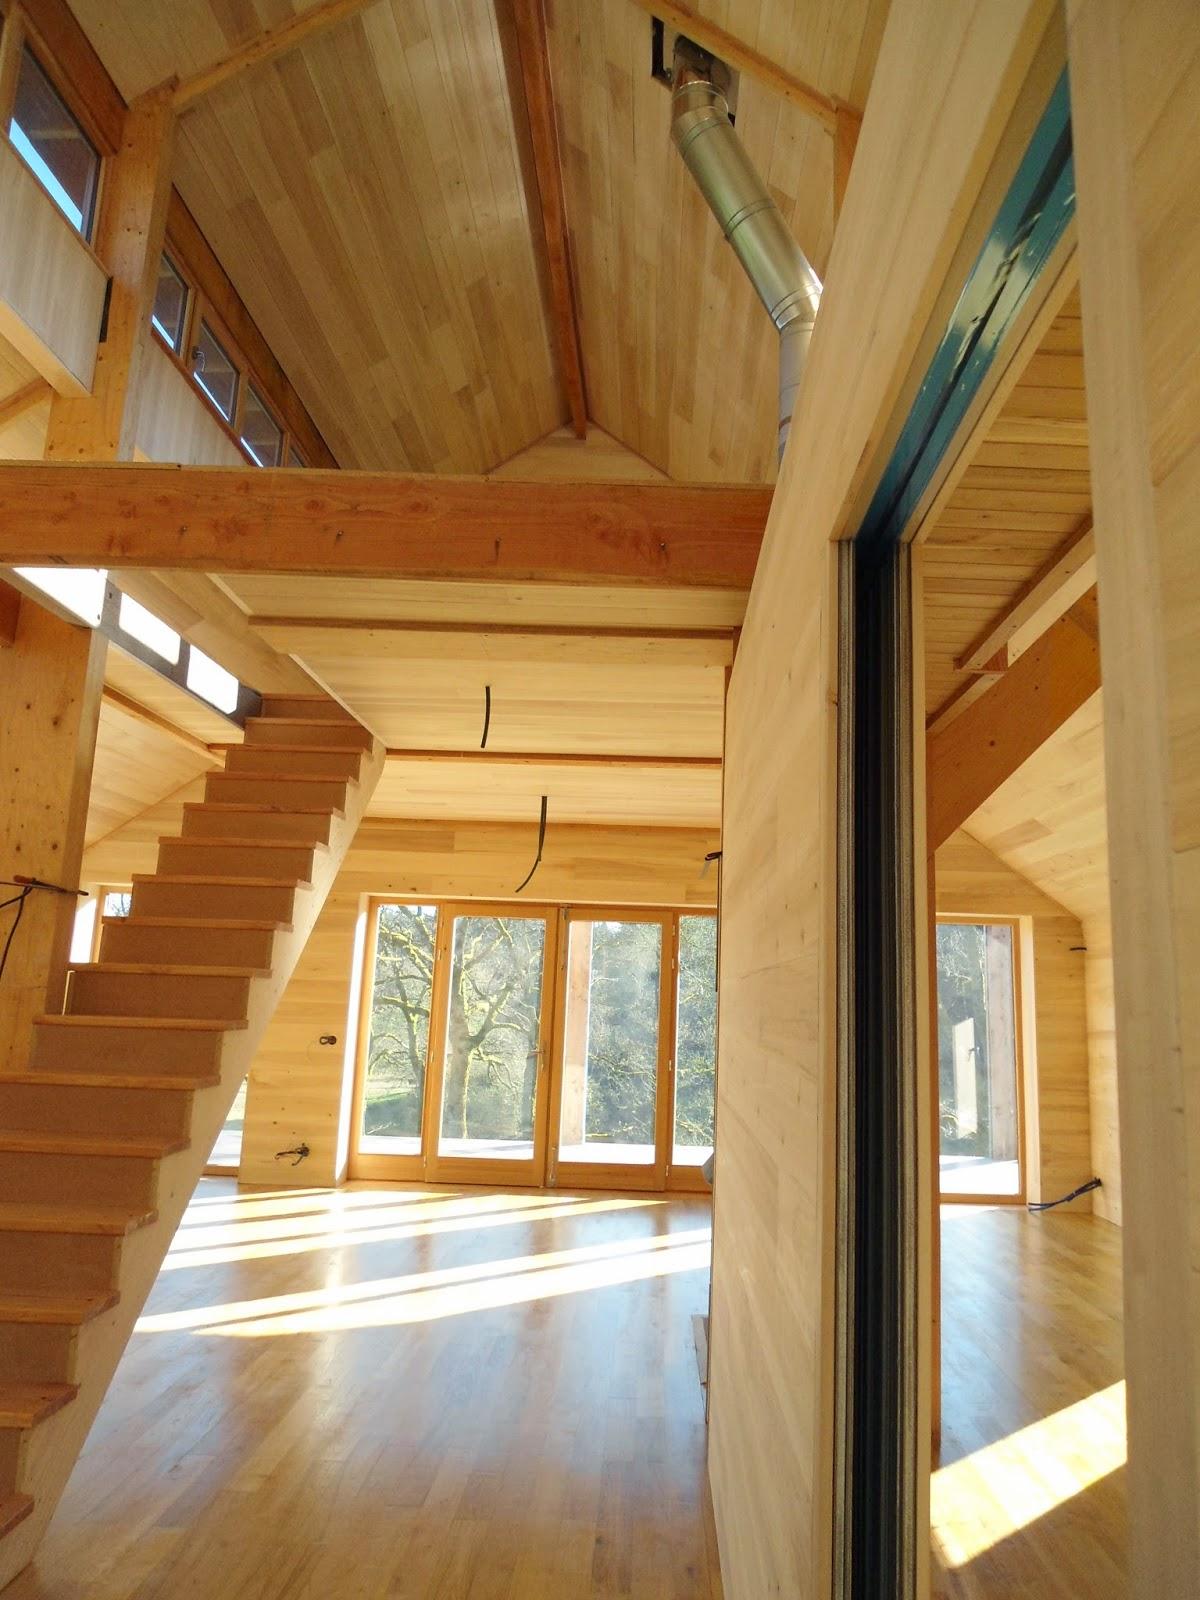 al 39 r t charpentes et structures. Black Bedroom Furniture Sets. Home Design Ideas